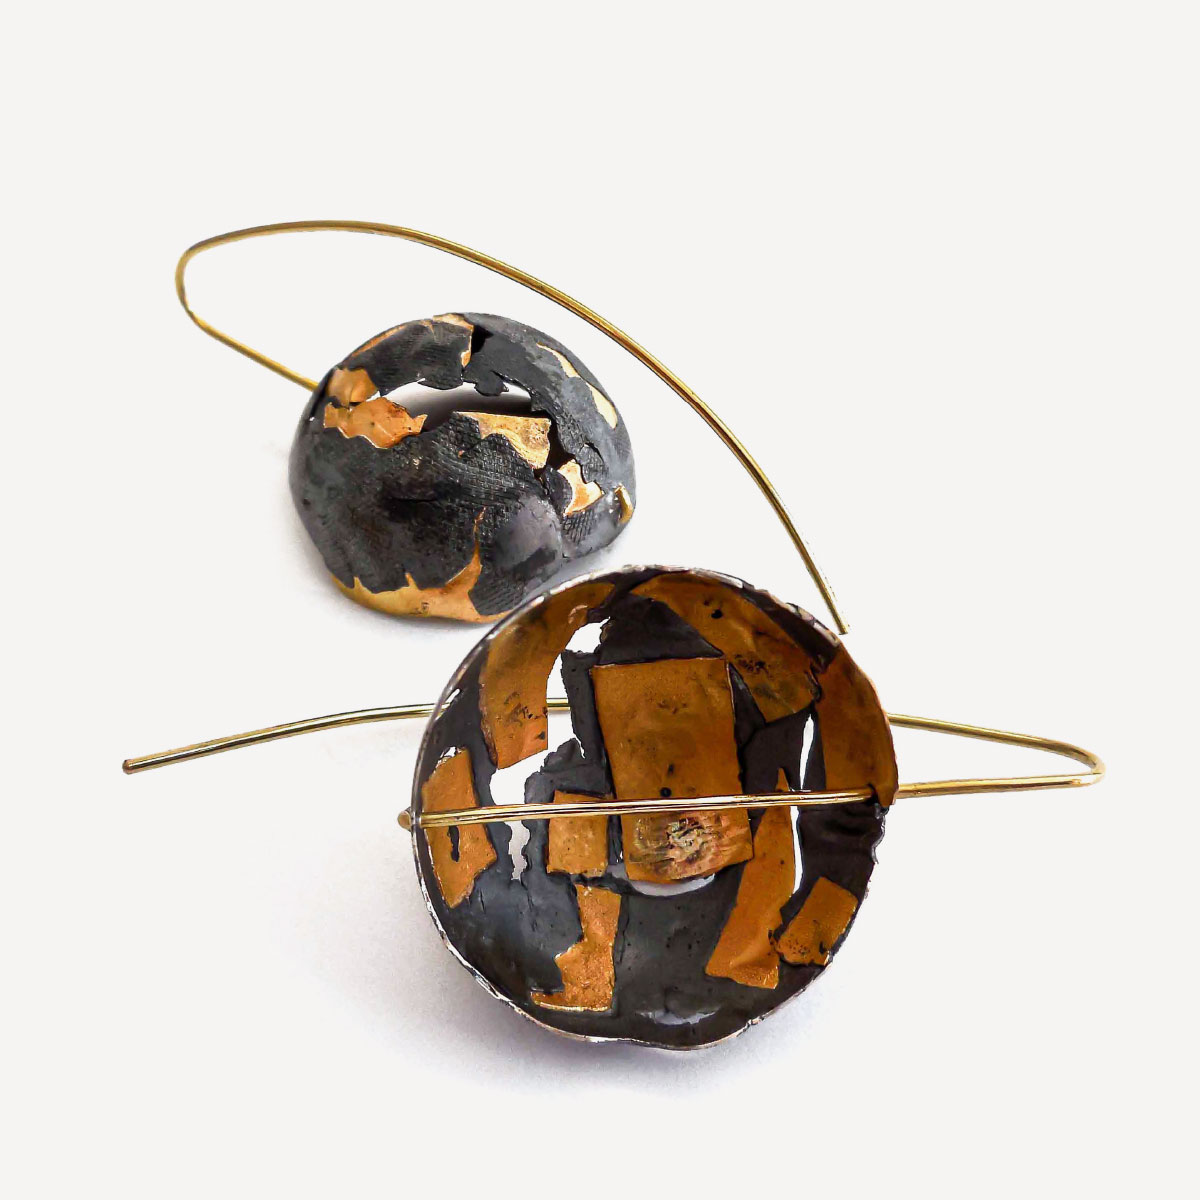 Earings mura yellow gold silver with patina Giorgio Chiarcos